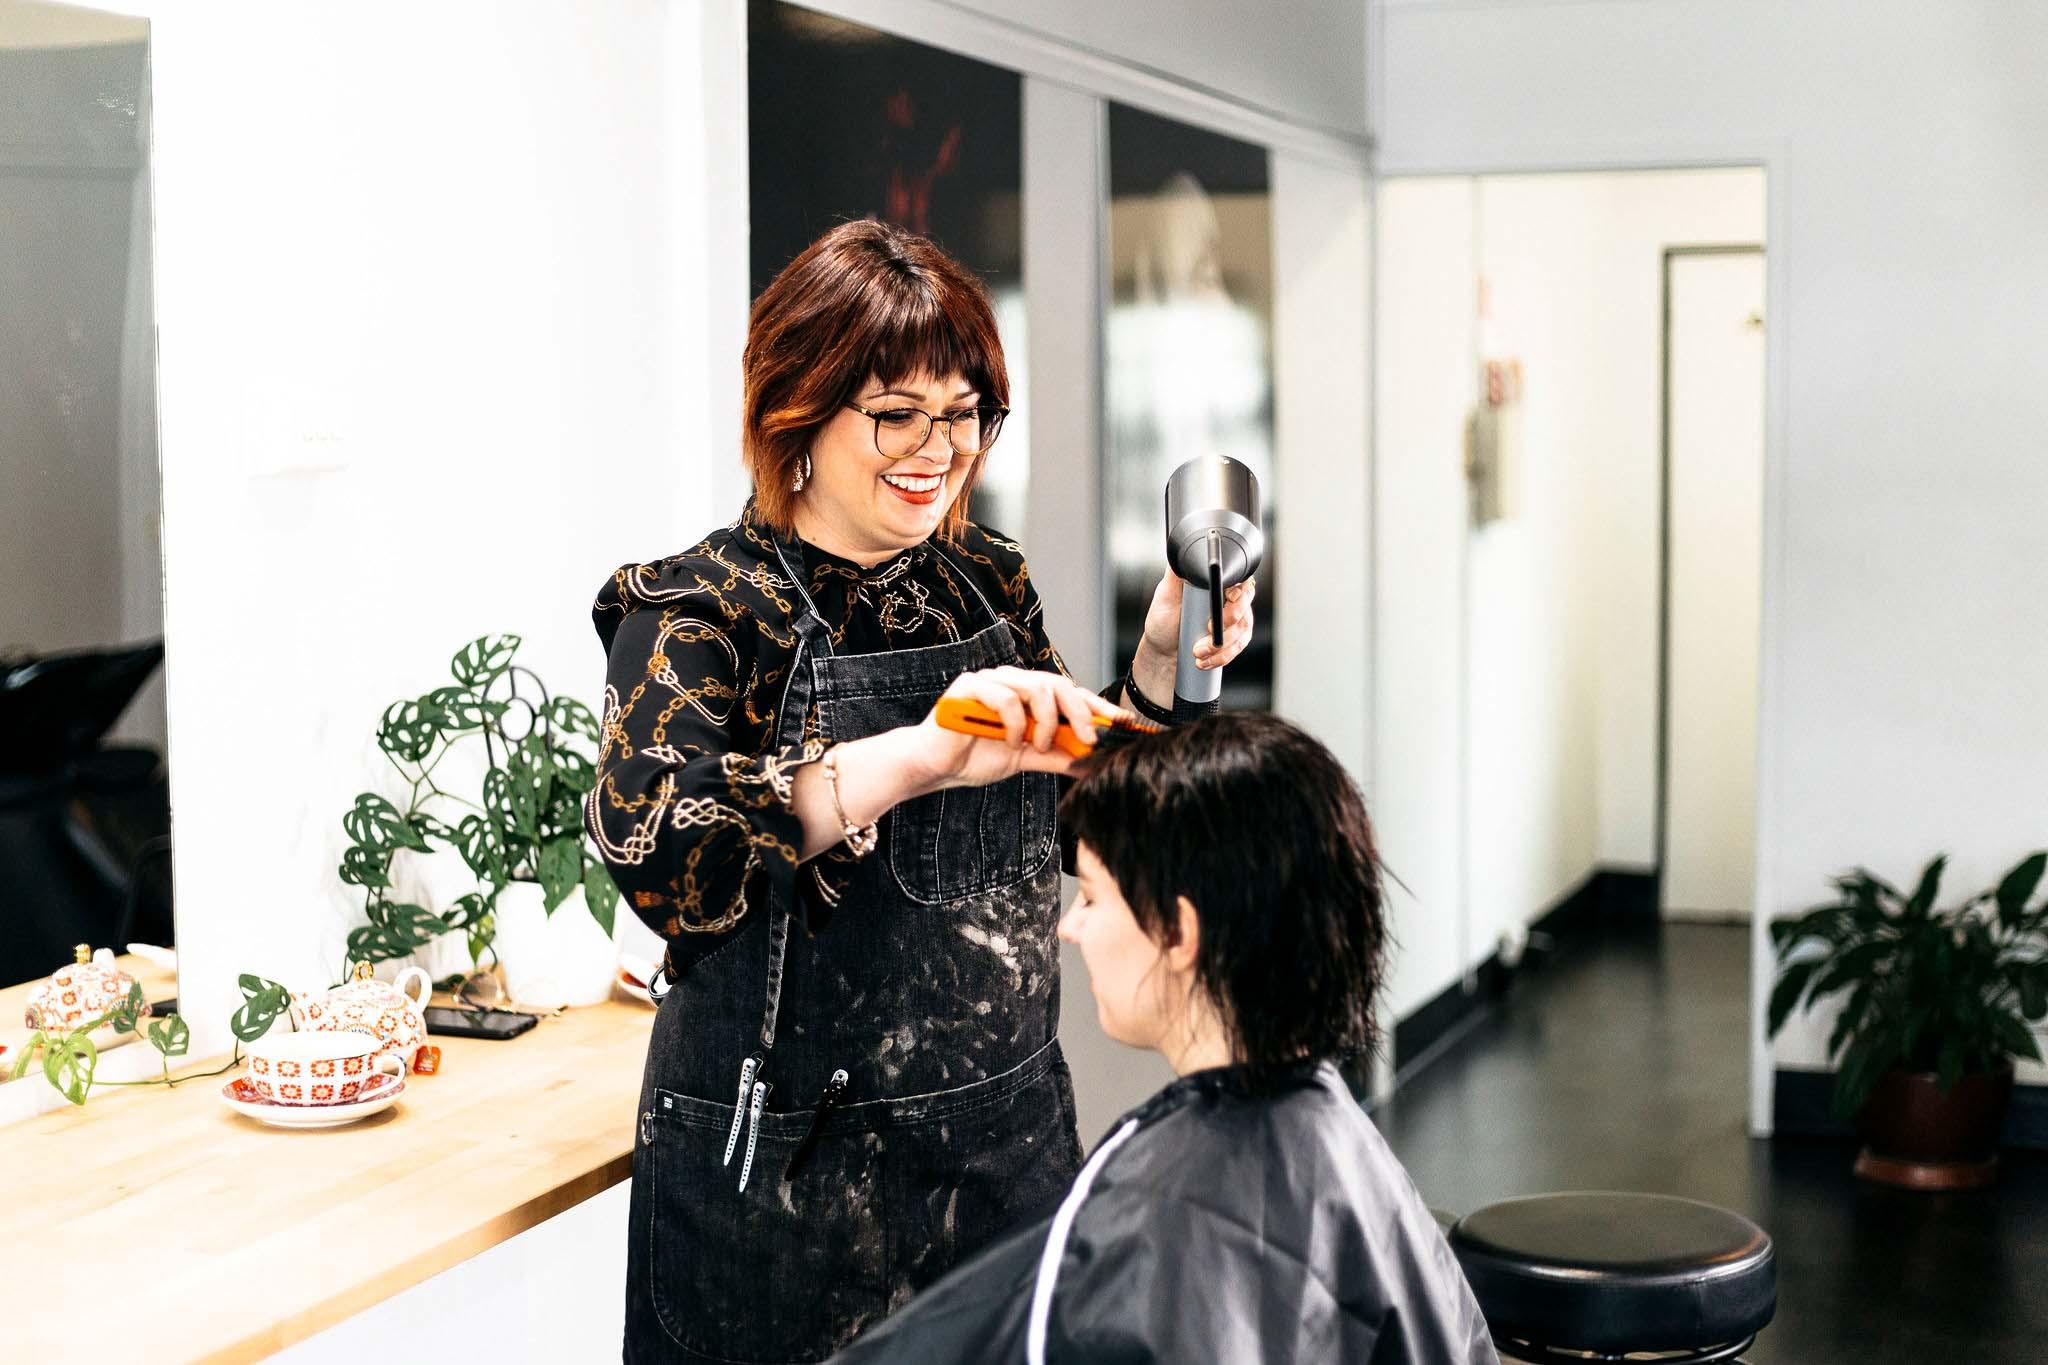 Platinum Hair-Cerisse Hairsylists-Hair-Salon-Chermside-07 3359 1055